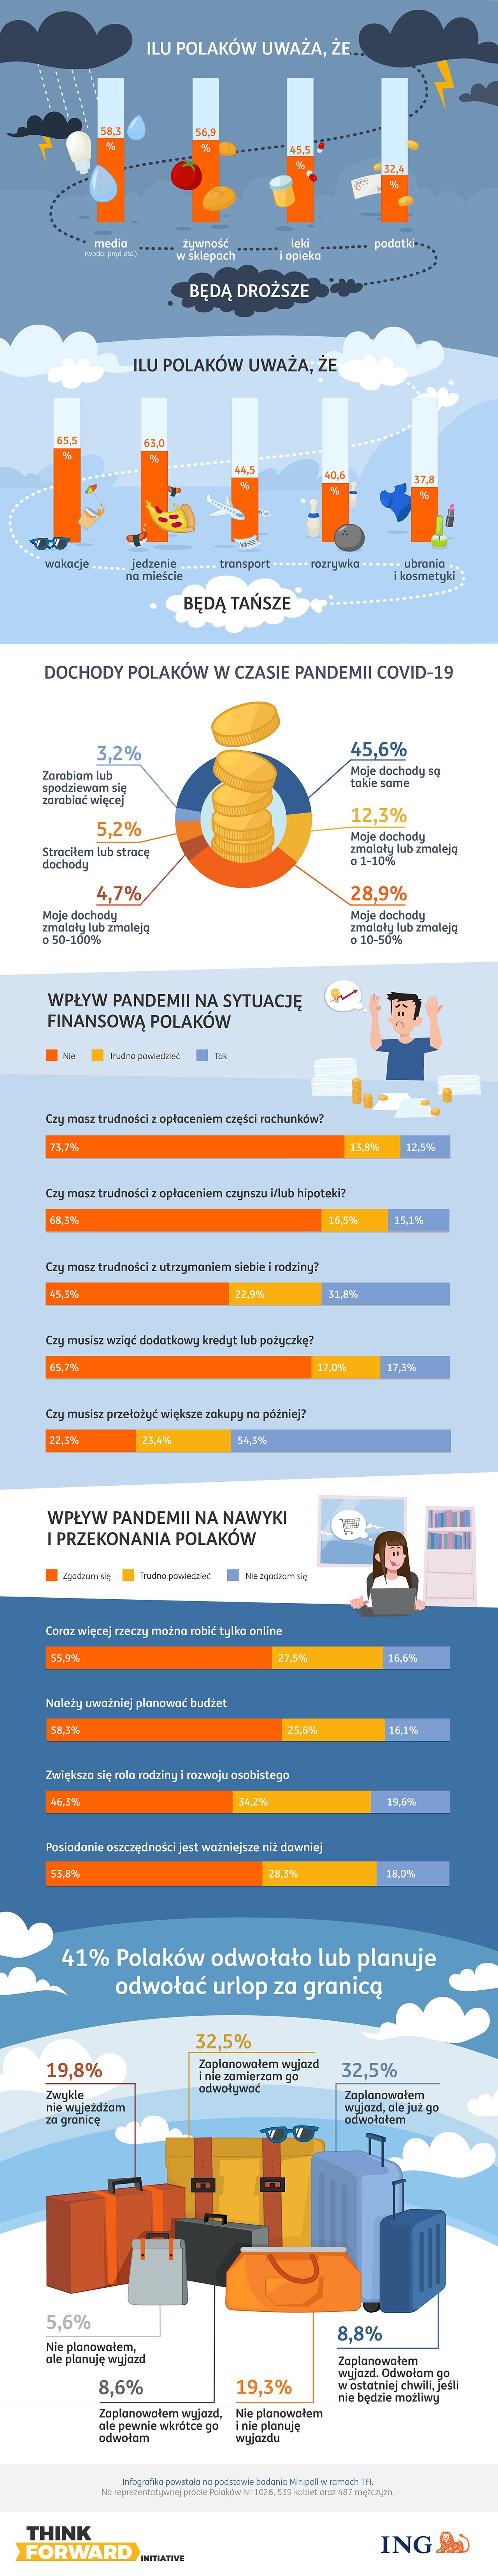 ING infografika COVID 2020 06 03-body.png